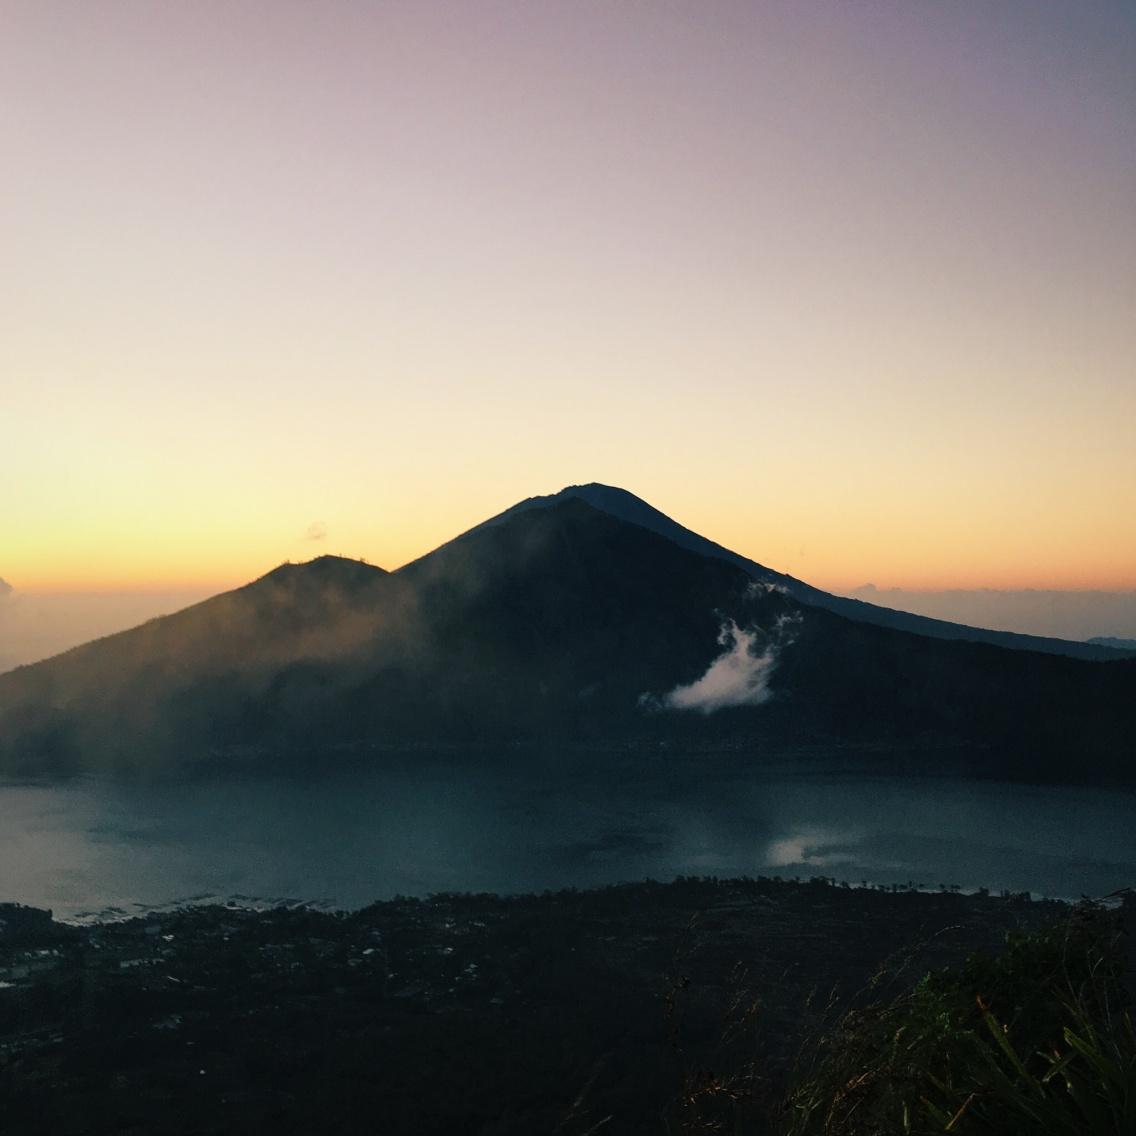 VSCO - View of the mountain, Bali  #bali #indonesia